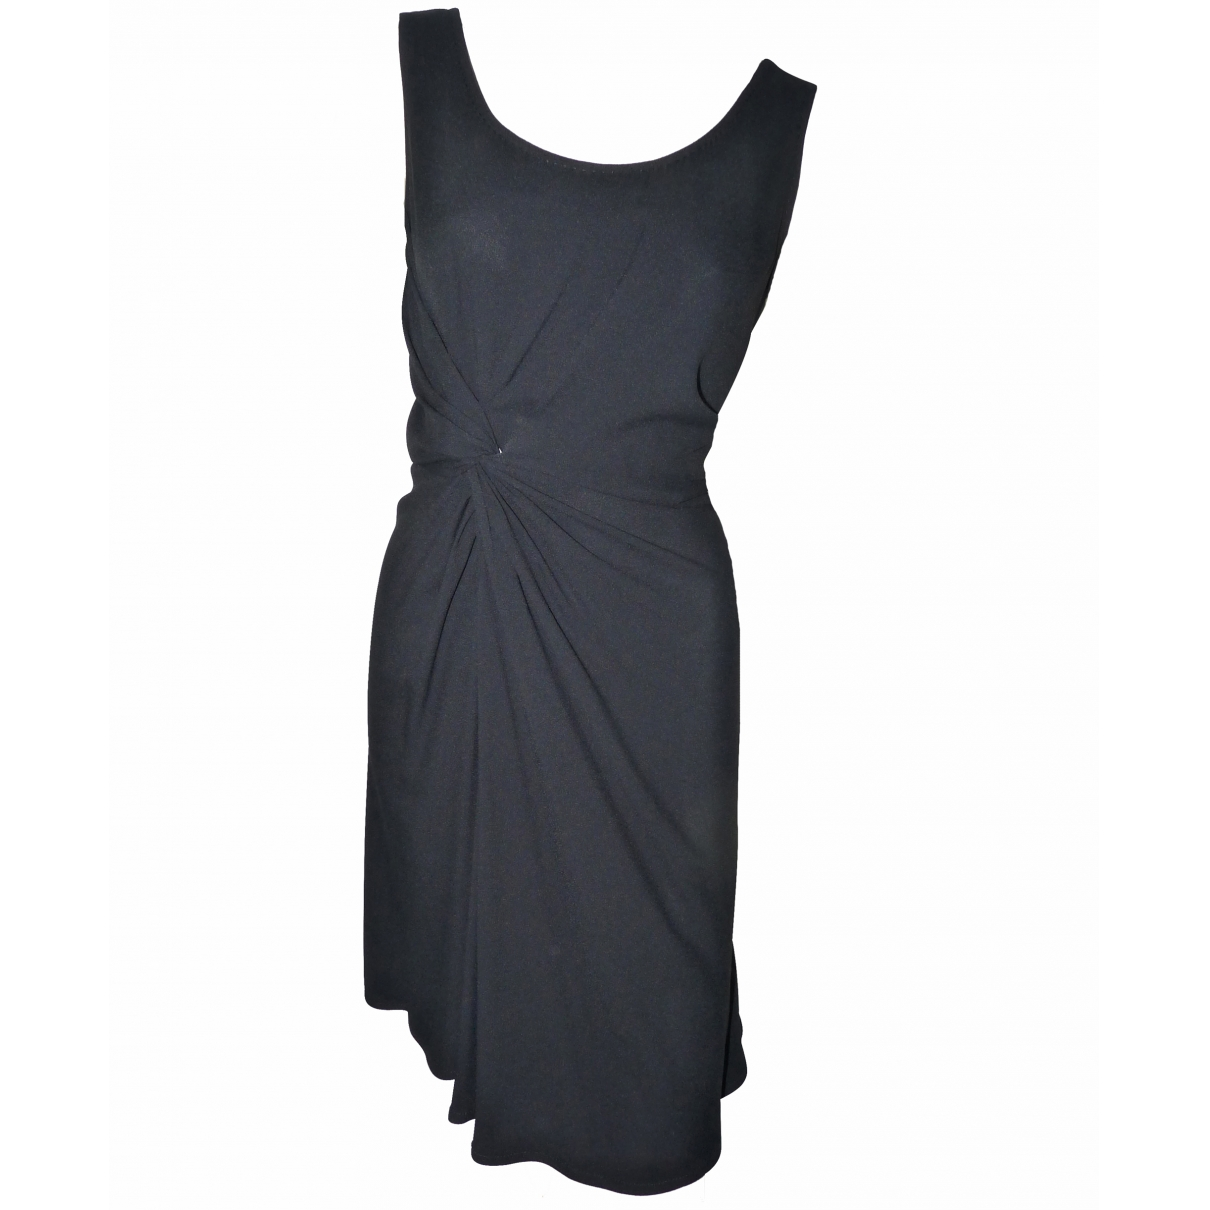 Dior \N Black dress for Women 38 FR